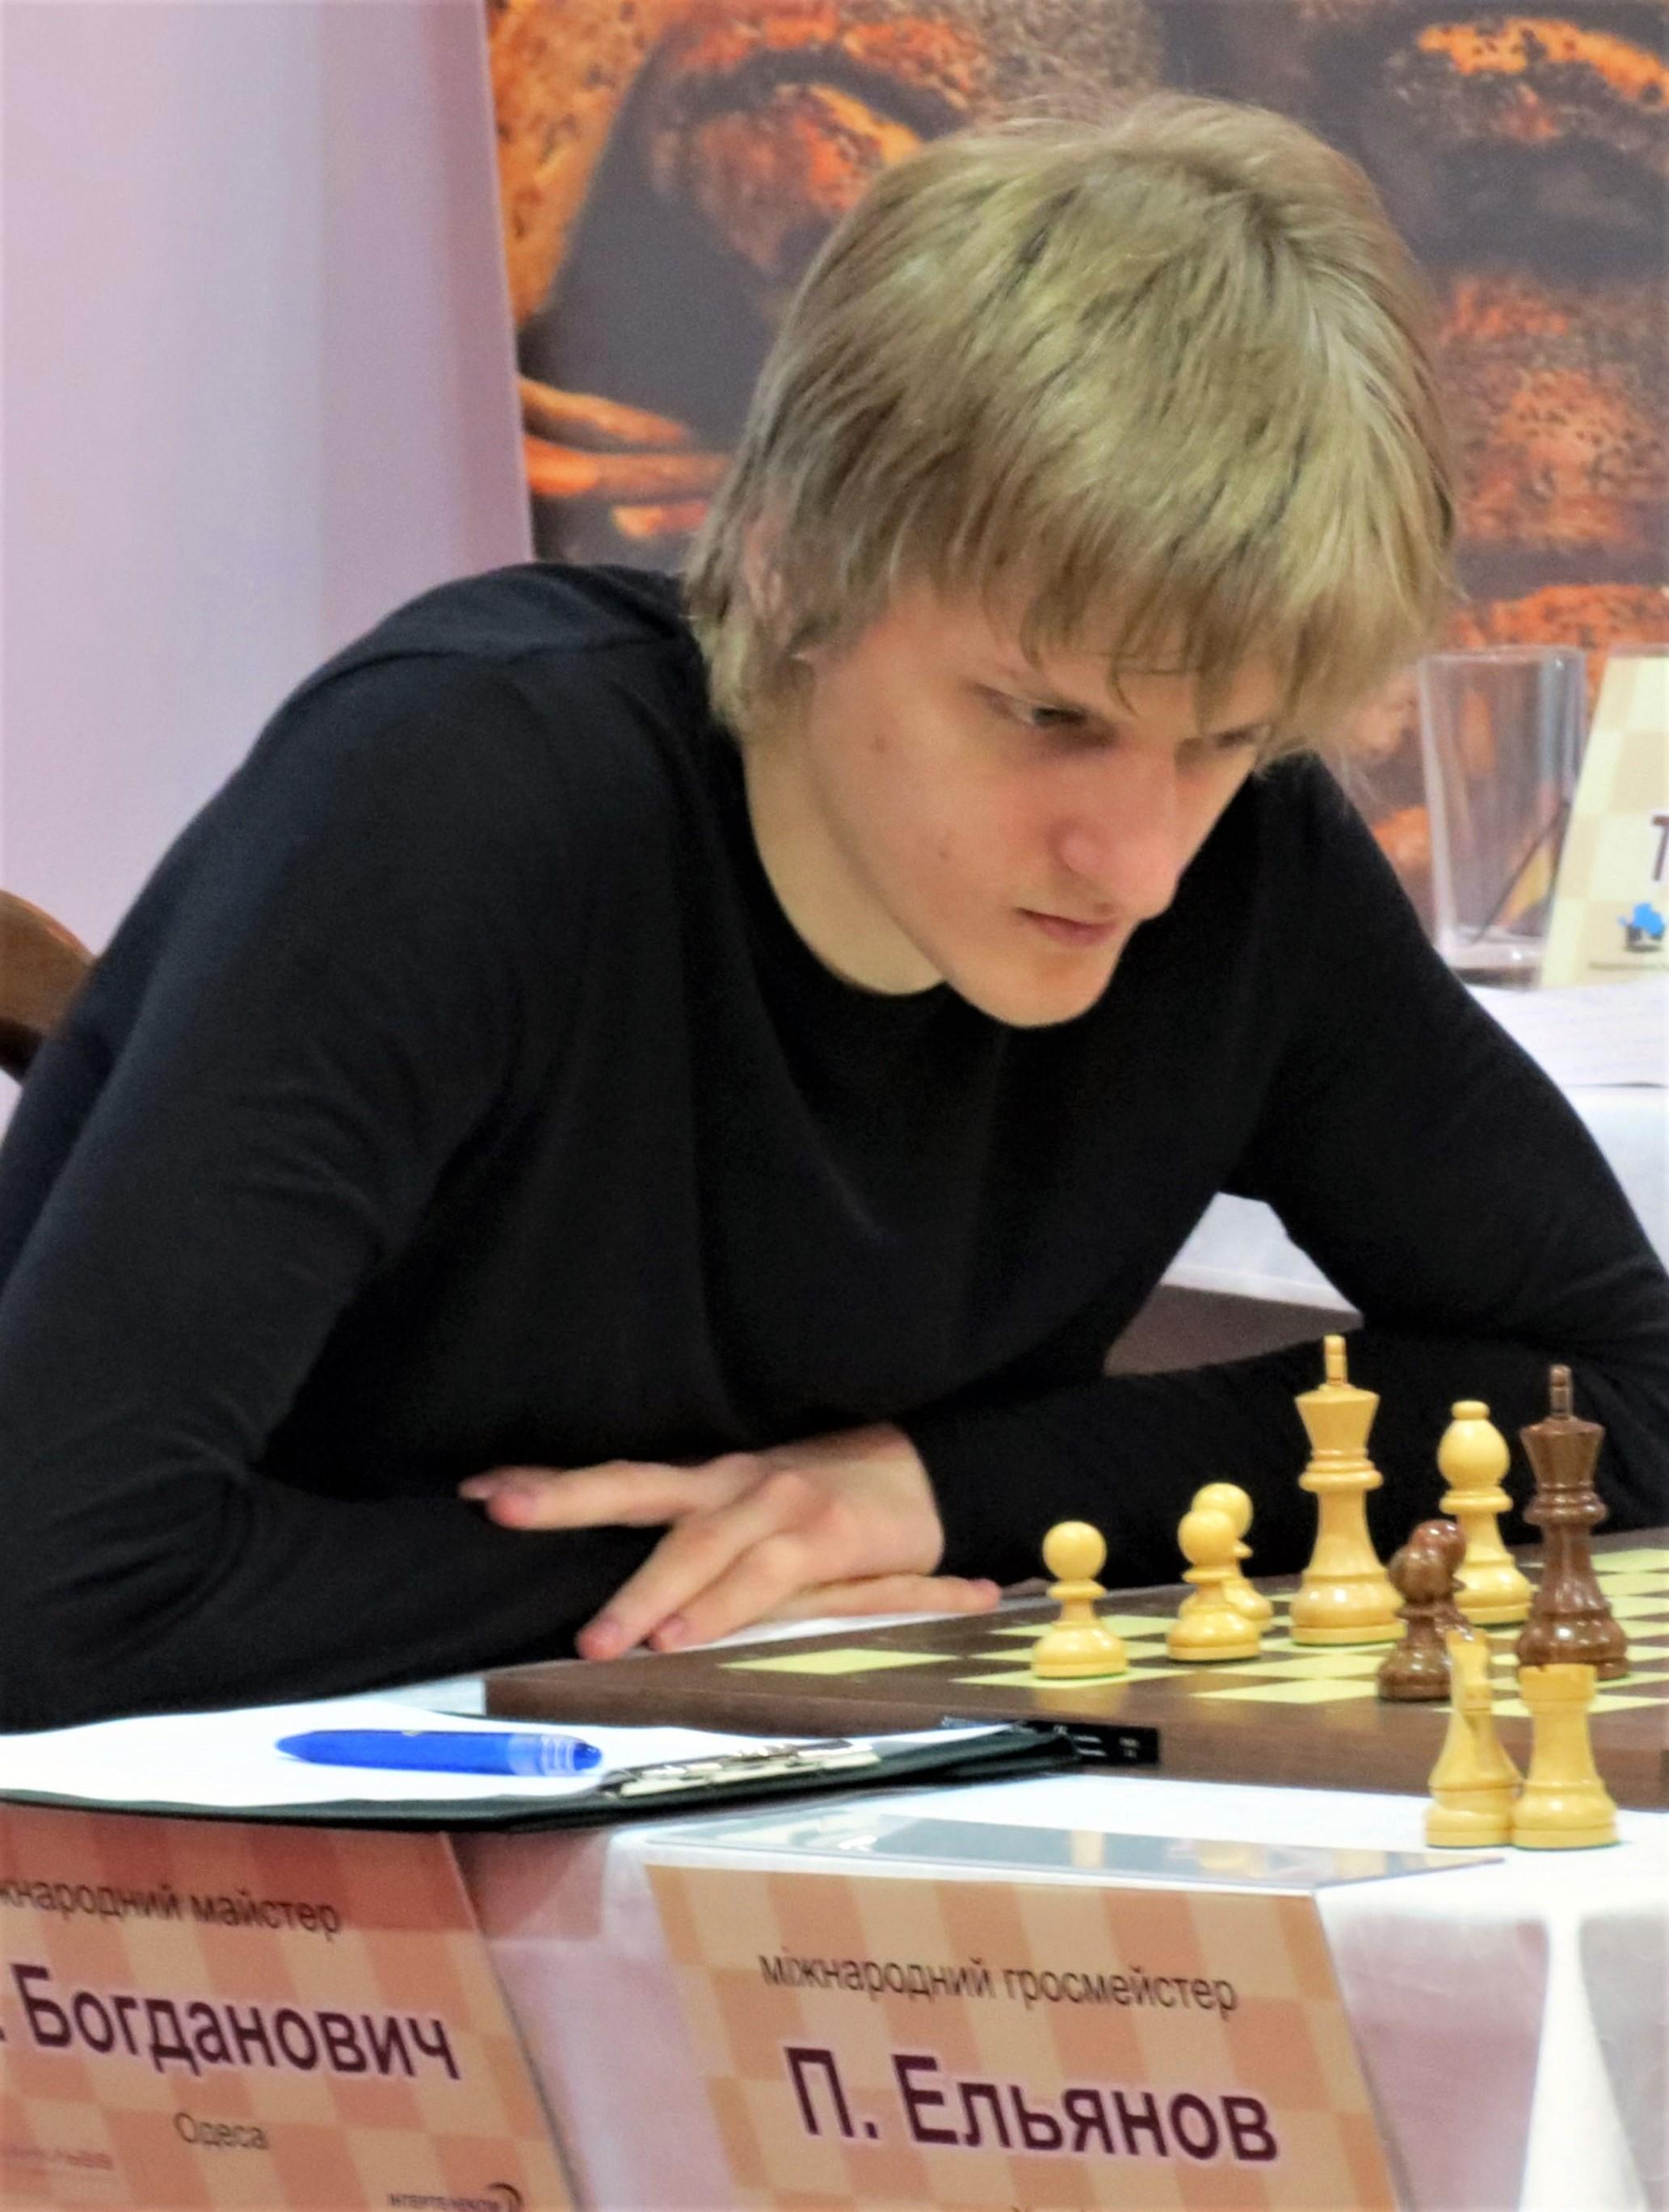 https://upload.wikimedia.org/wikipedia/commons/0/08/Stanislav_Bogdanovich_2014